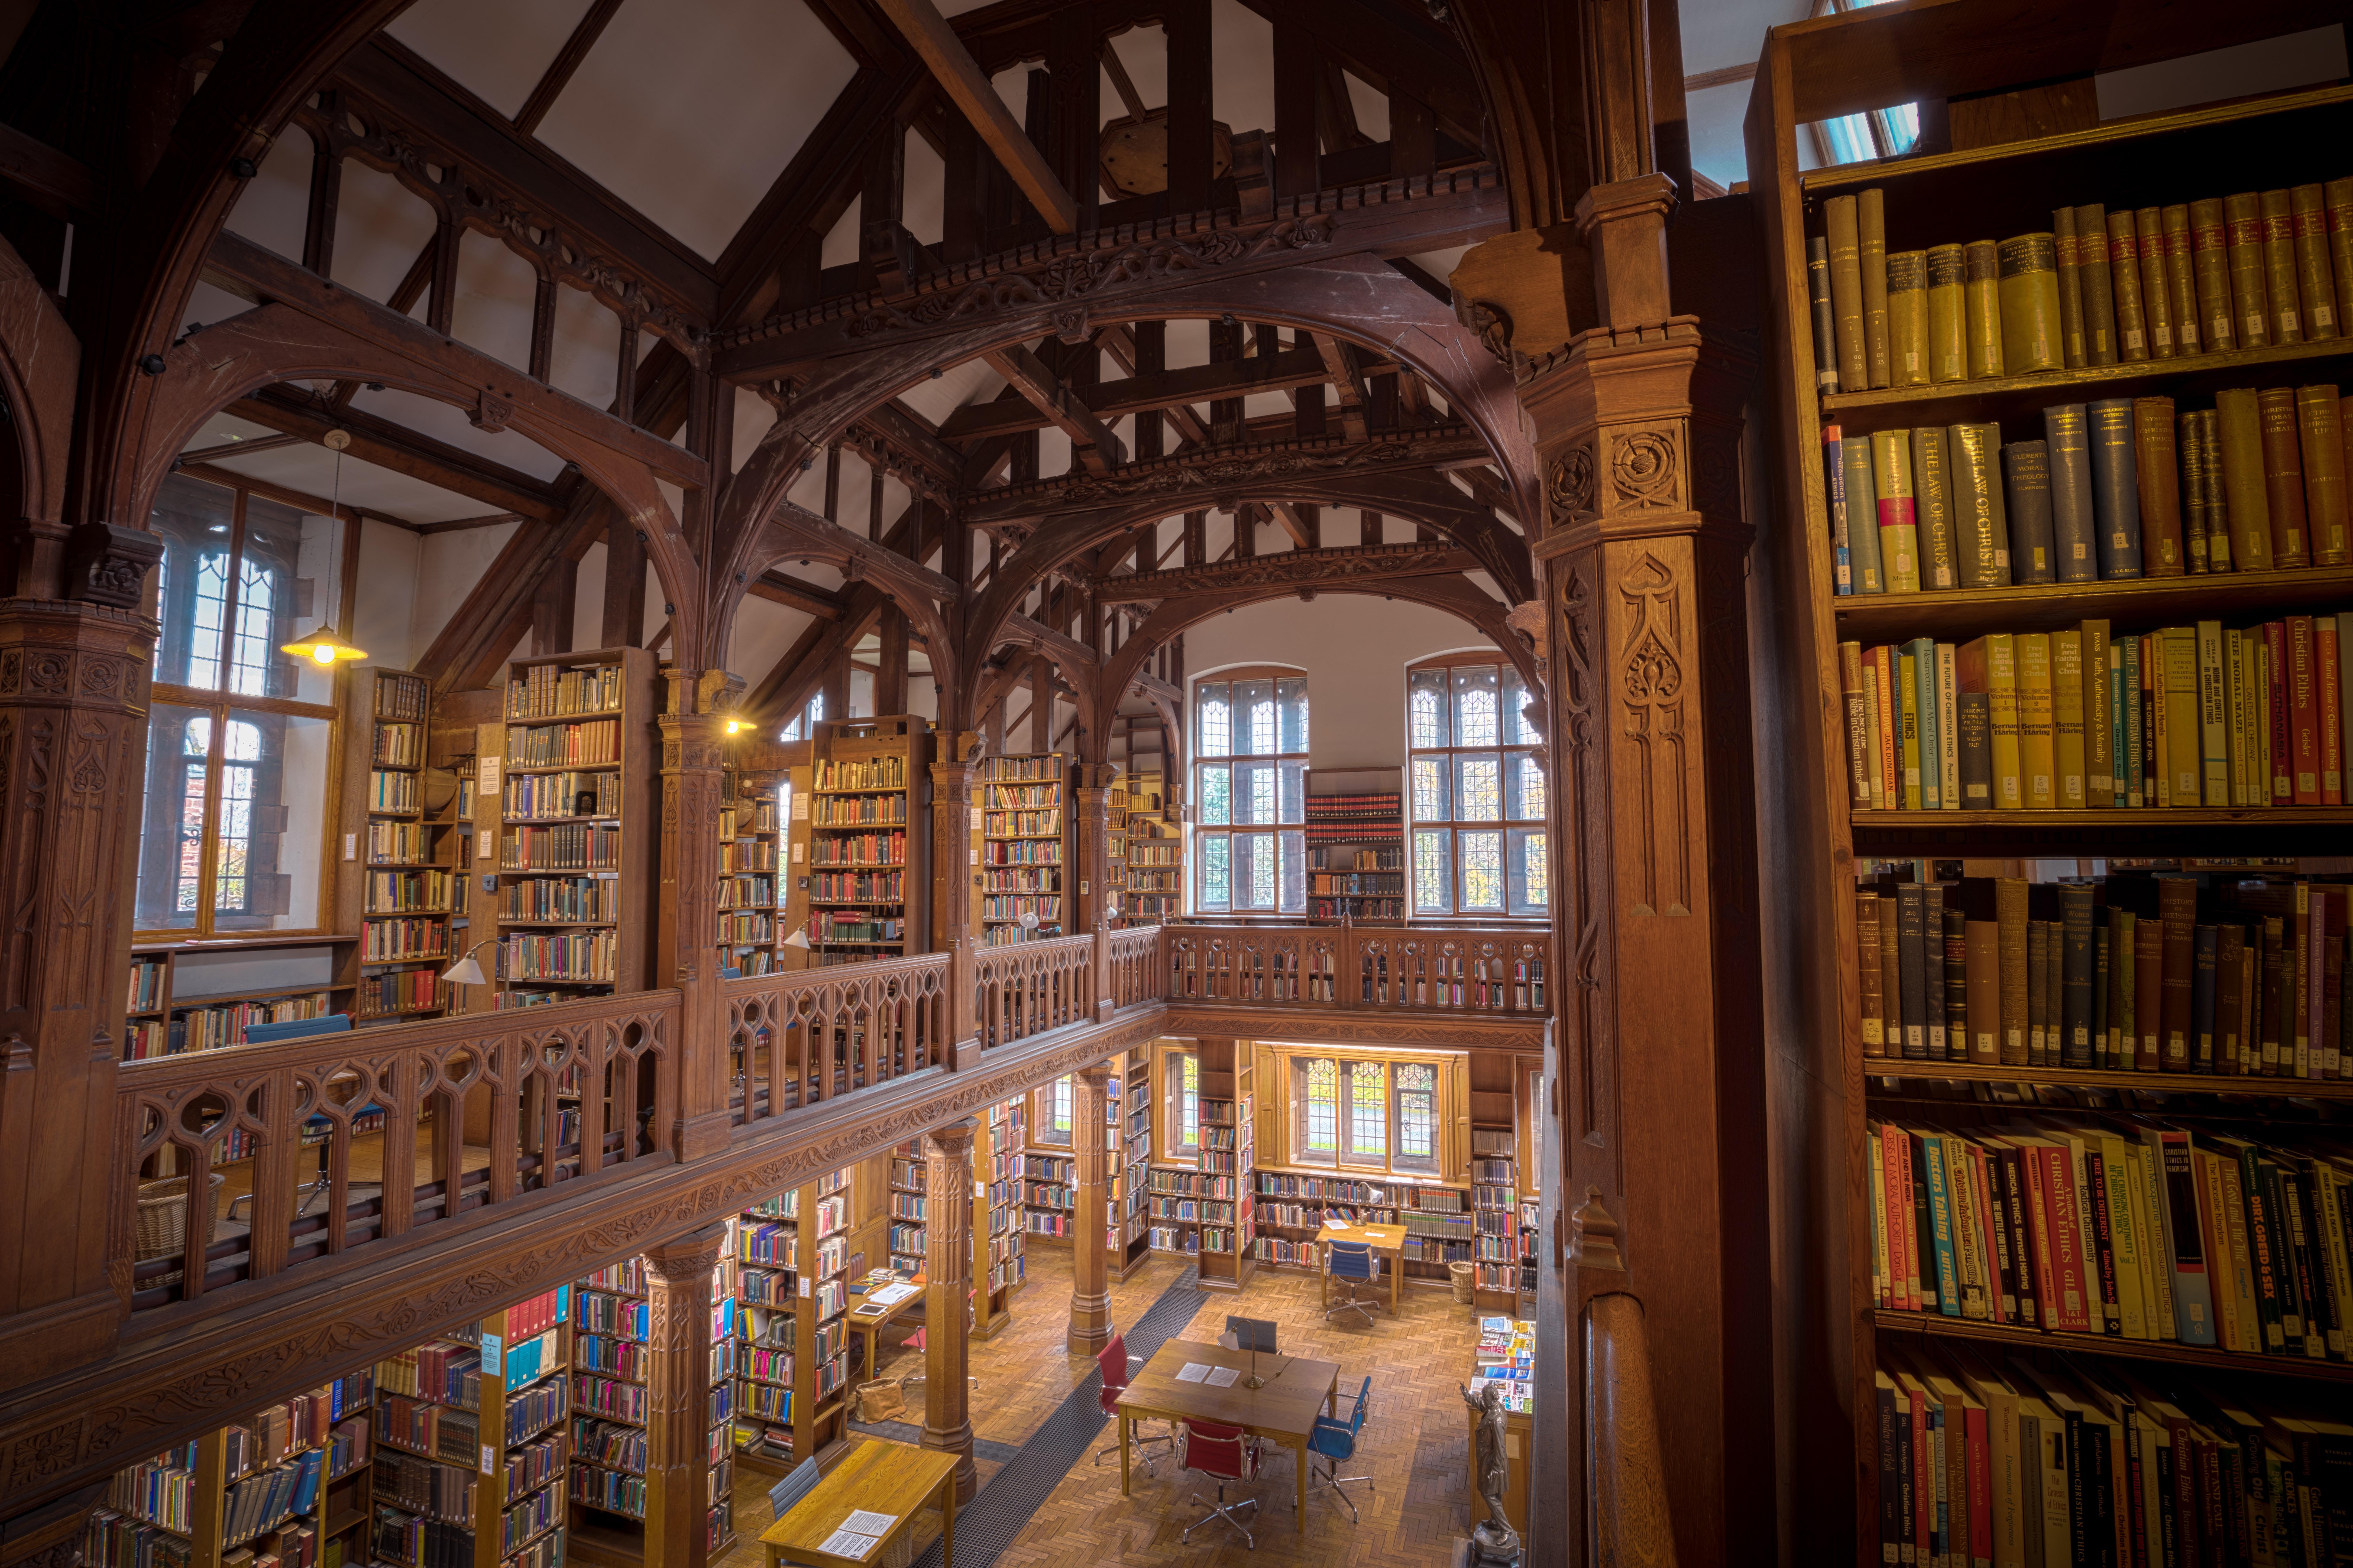 close-up photo of books arranged on shelf